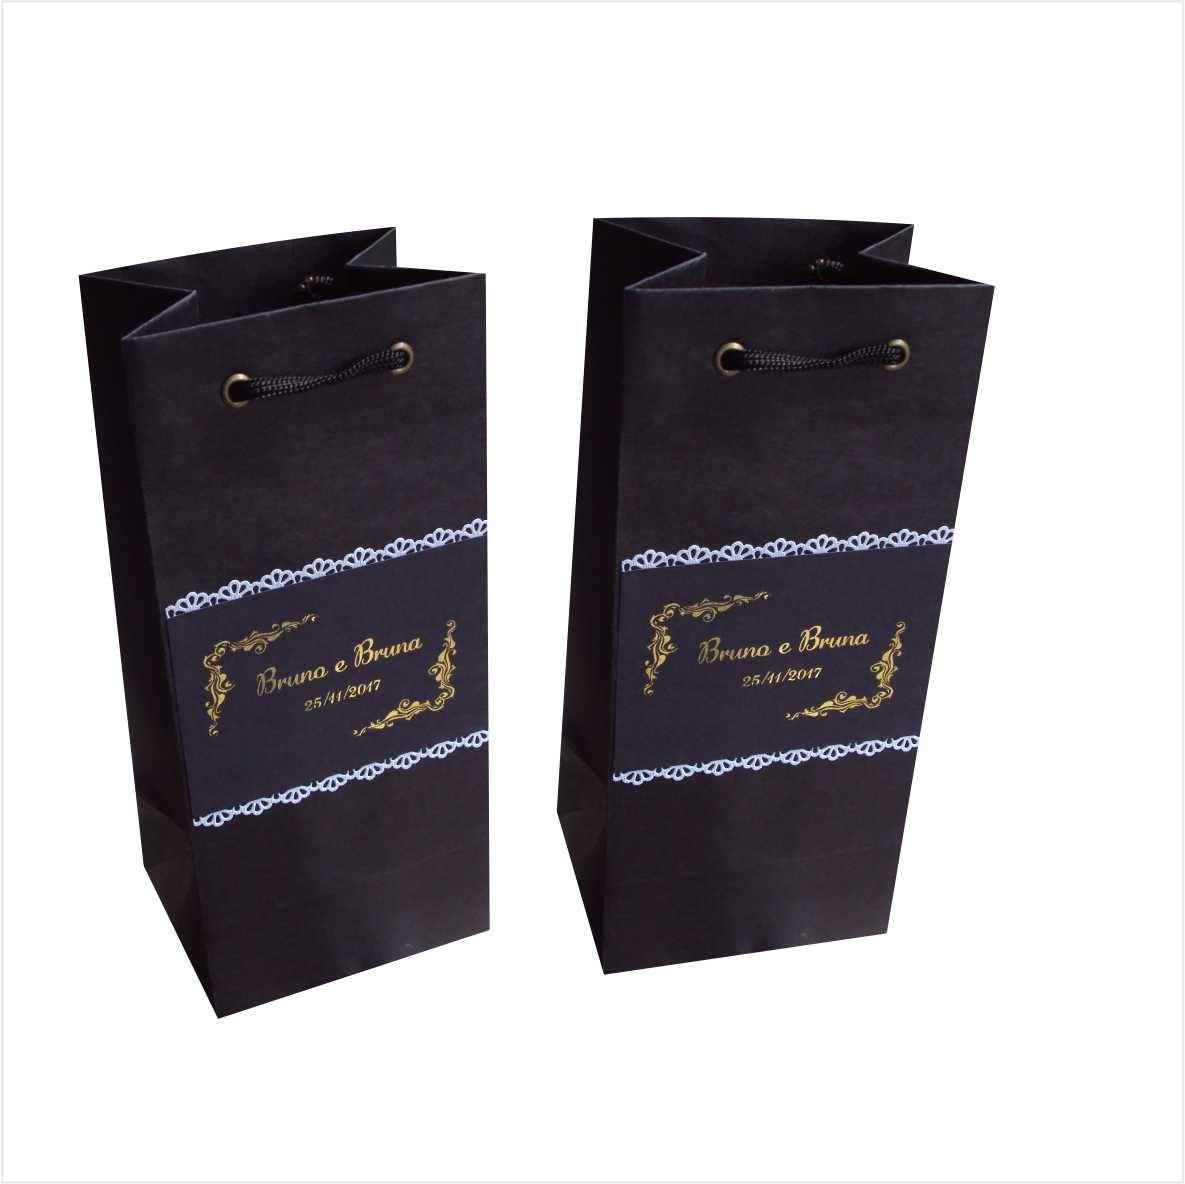 Sacola de papel personalizada - cor preta ideal para mini garrafa (11x24x9 cm) 20 unidades